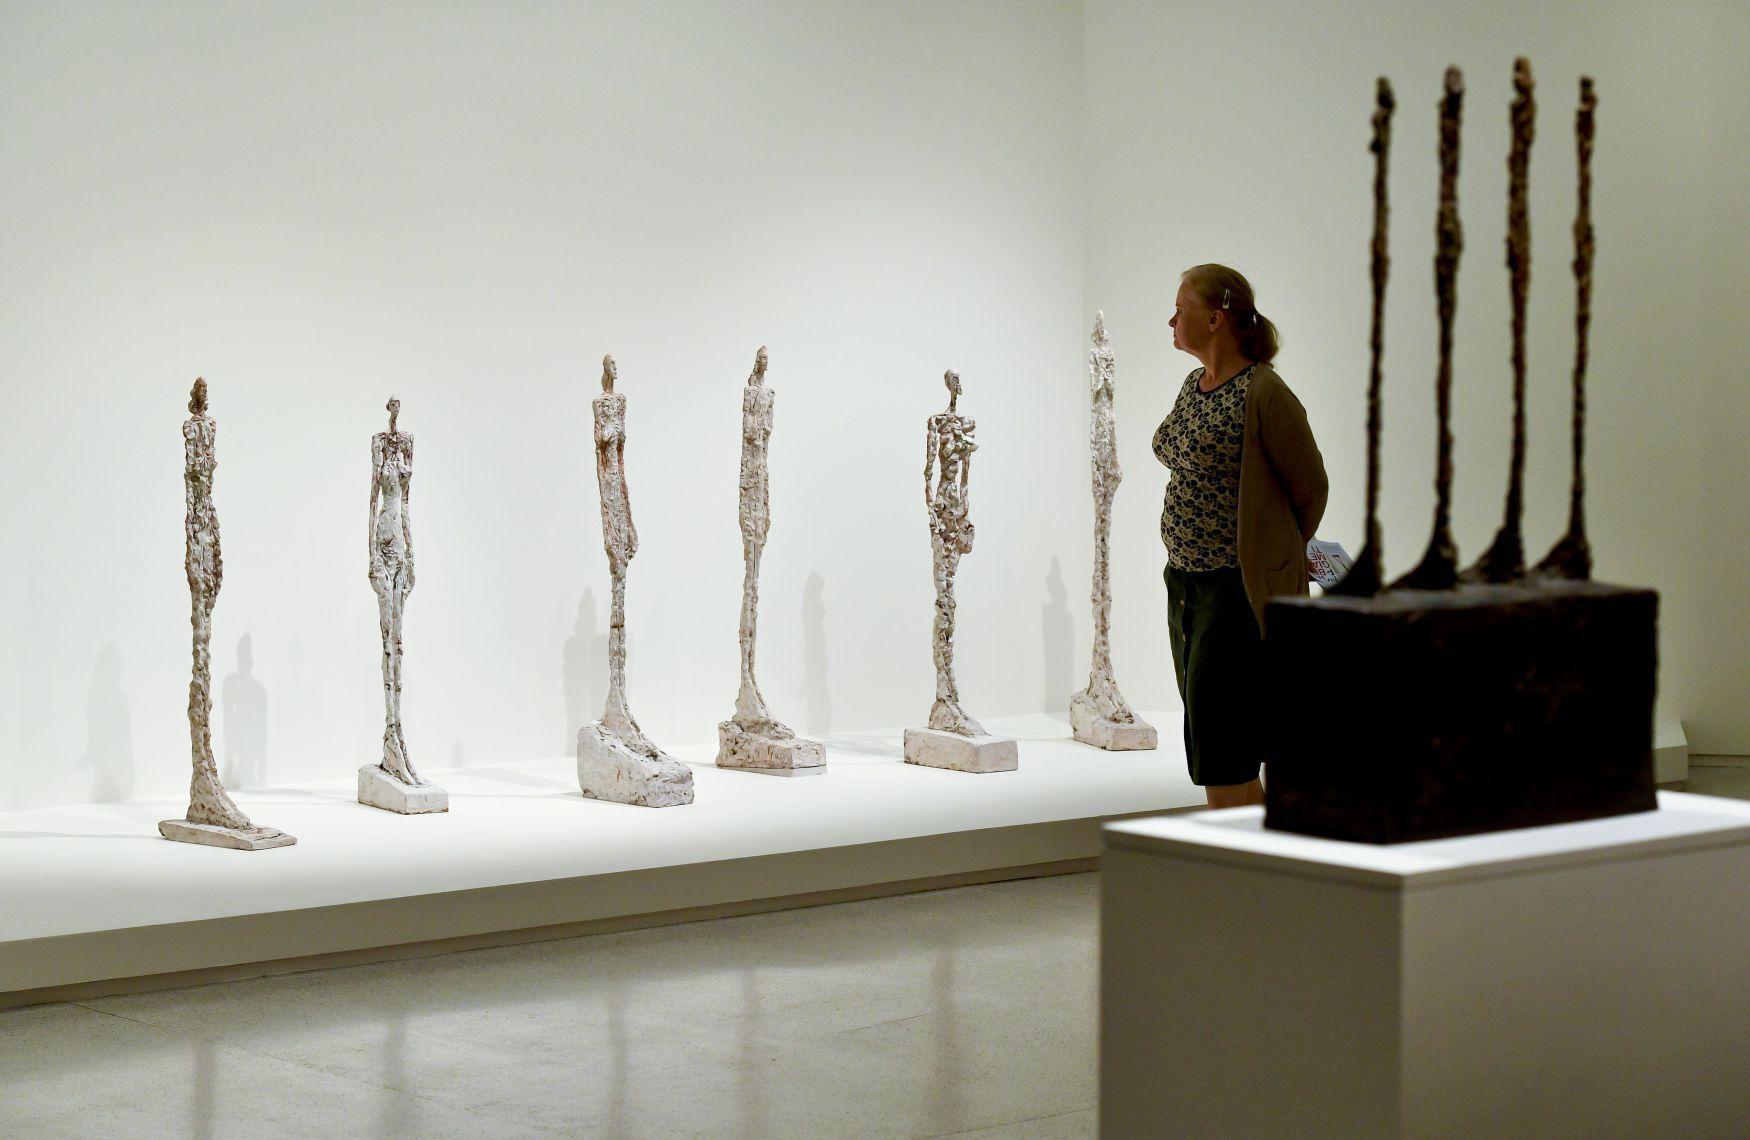 Prague exhibition captures full range of sculptor Giacometti's